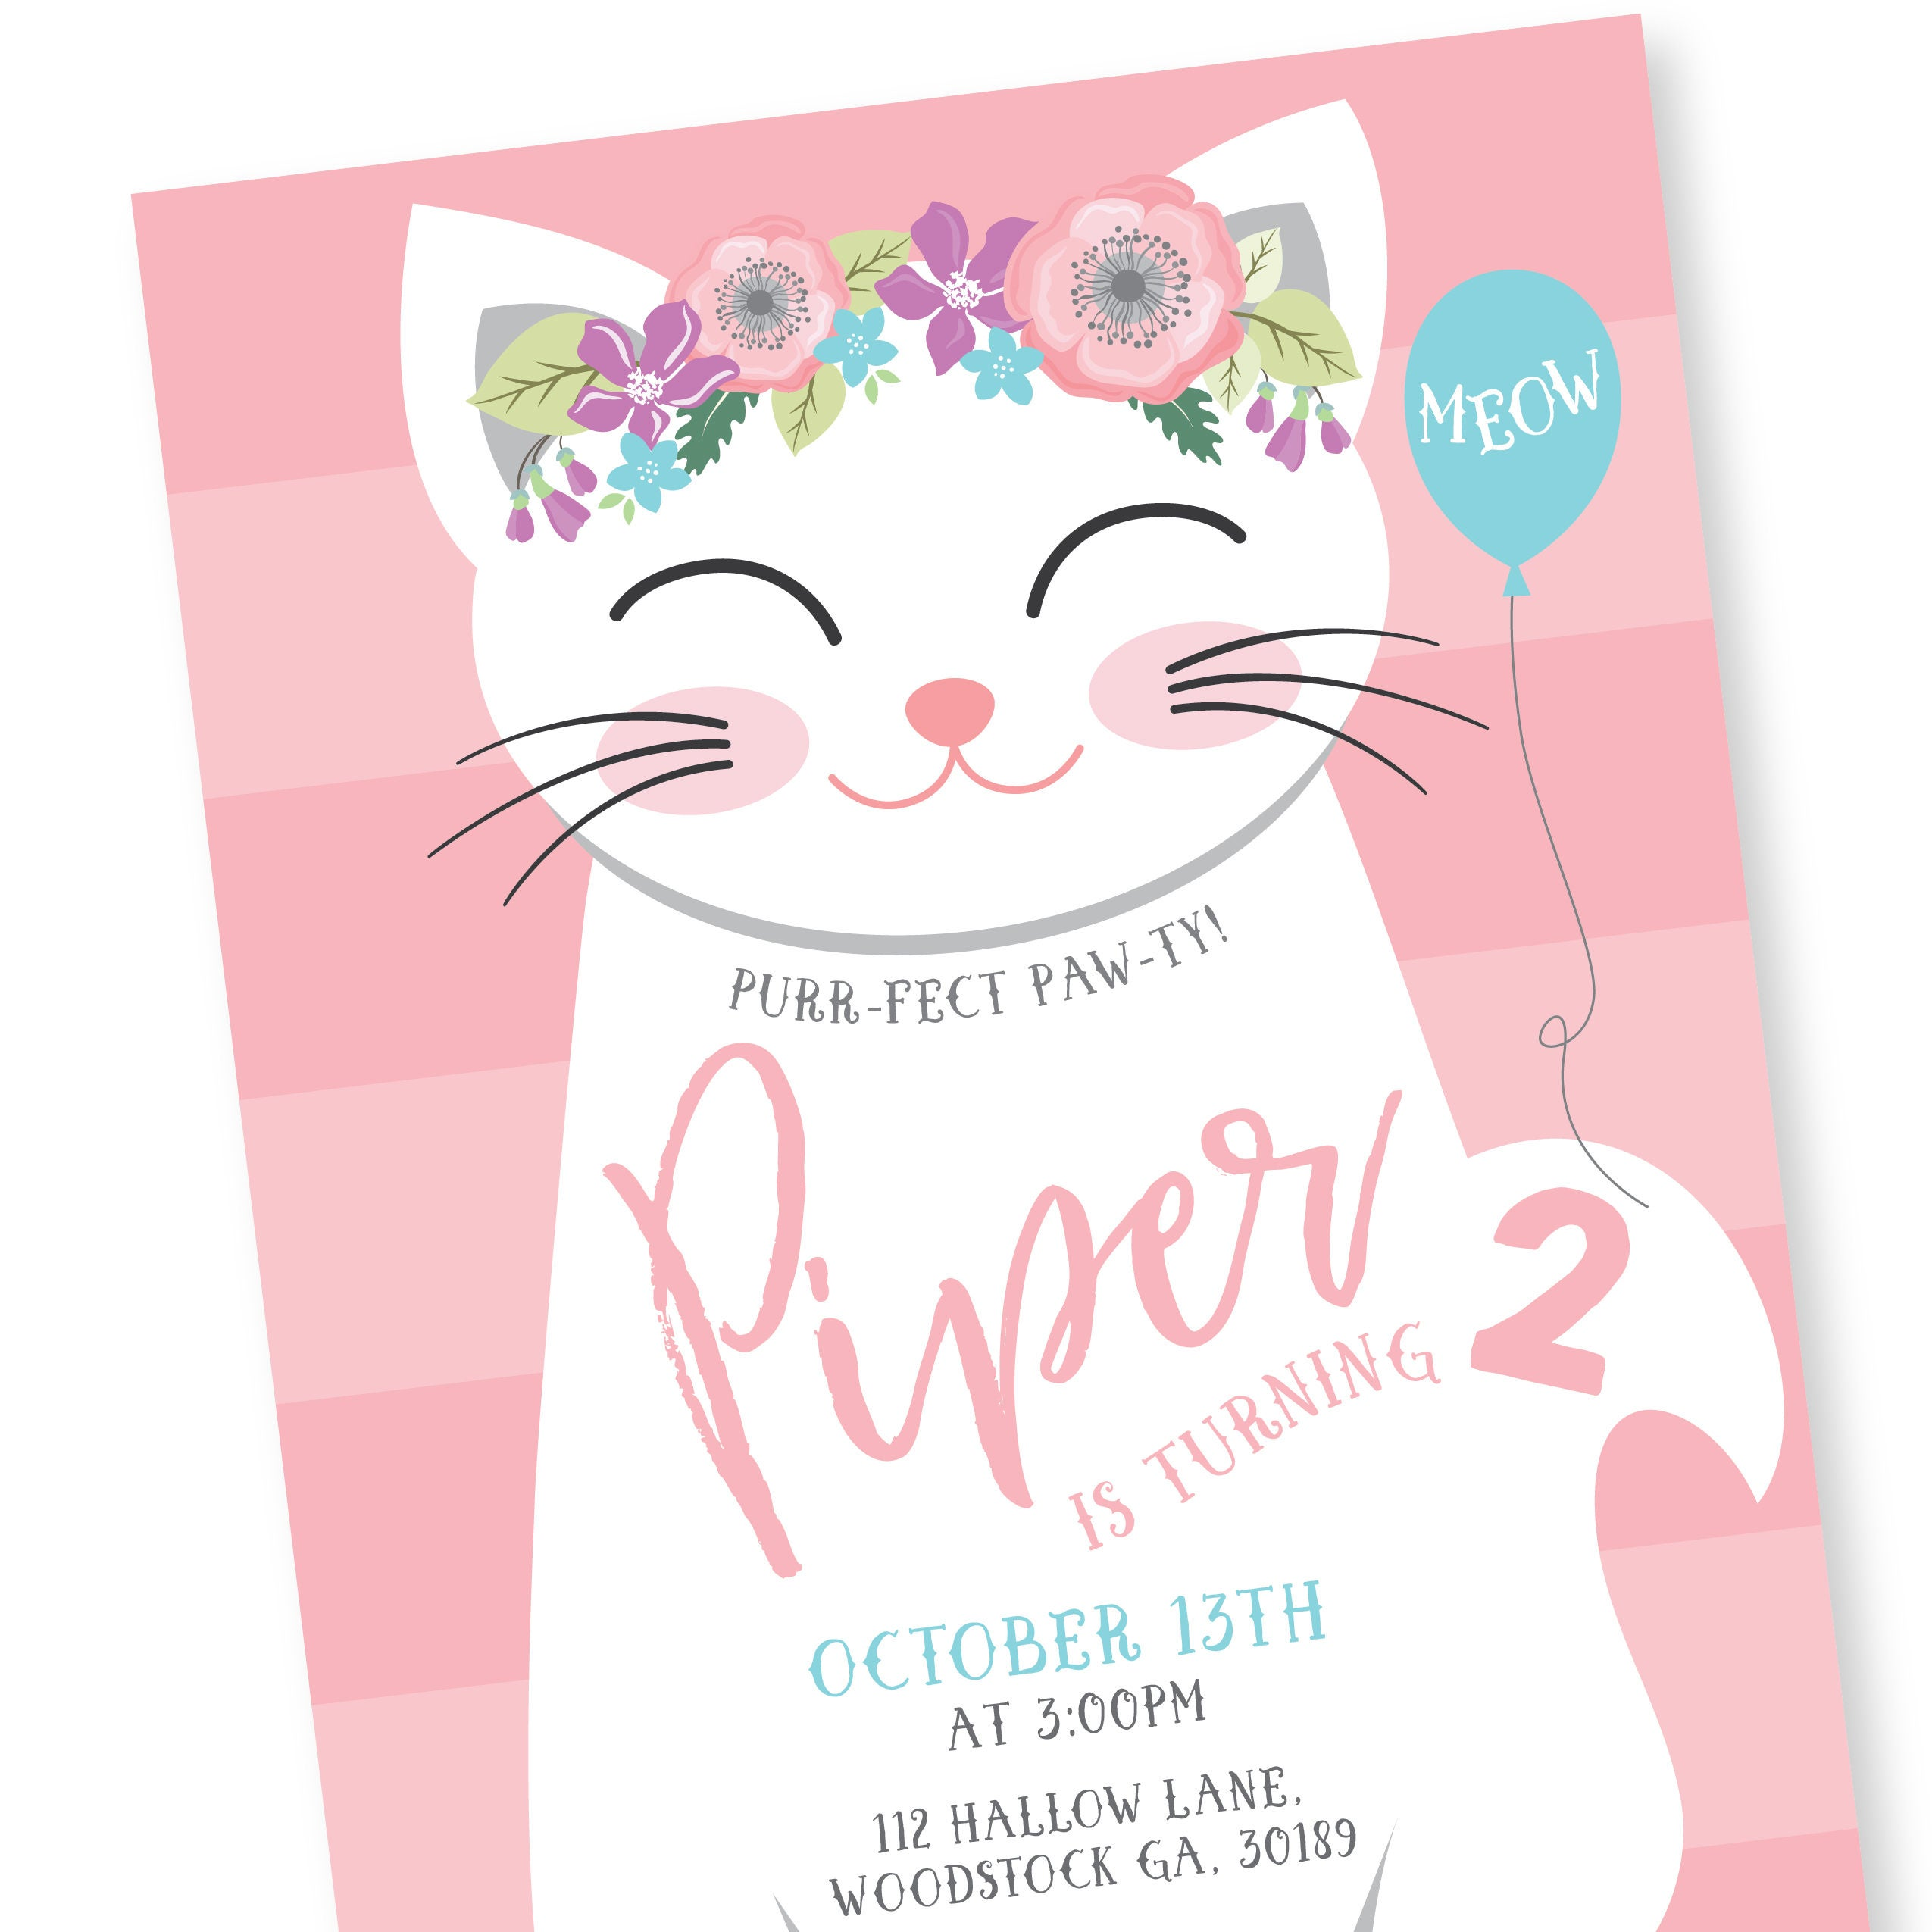 Cat birthday party invitation kitten cat birthday girl printable gallery photo gallery photo gallery photo gallery photo filmwisefo